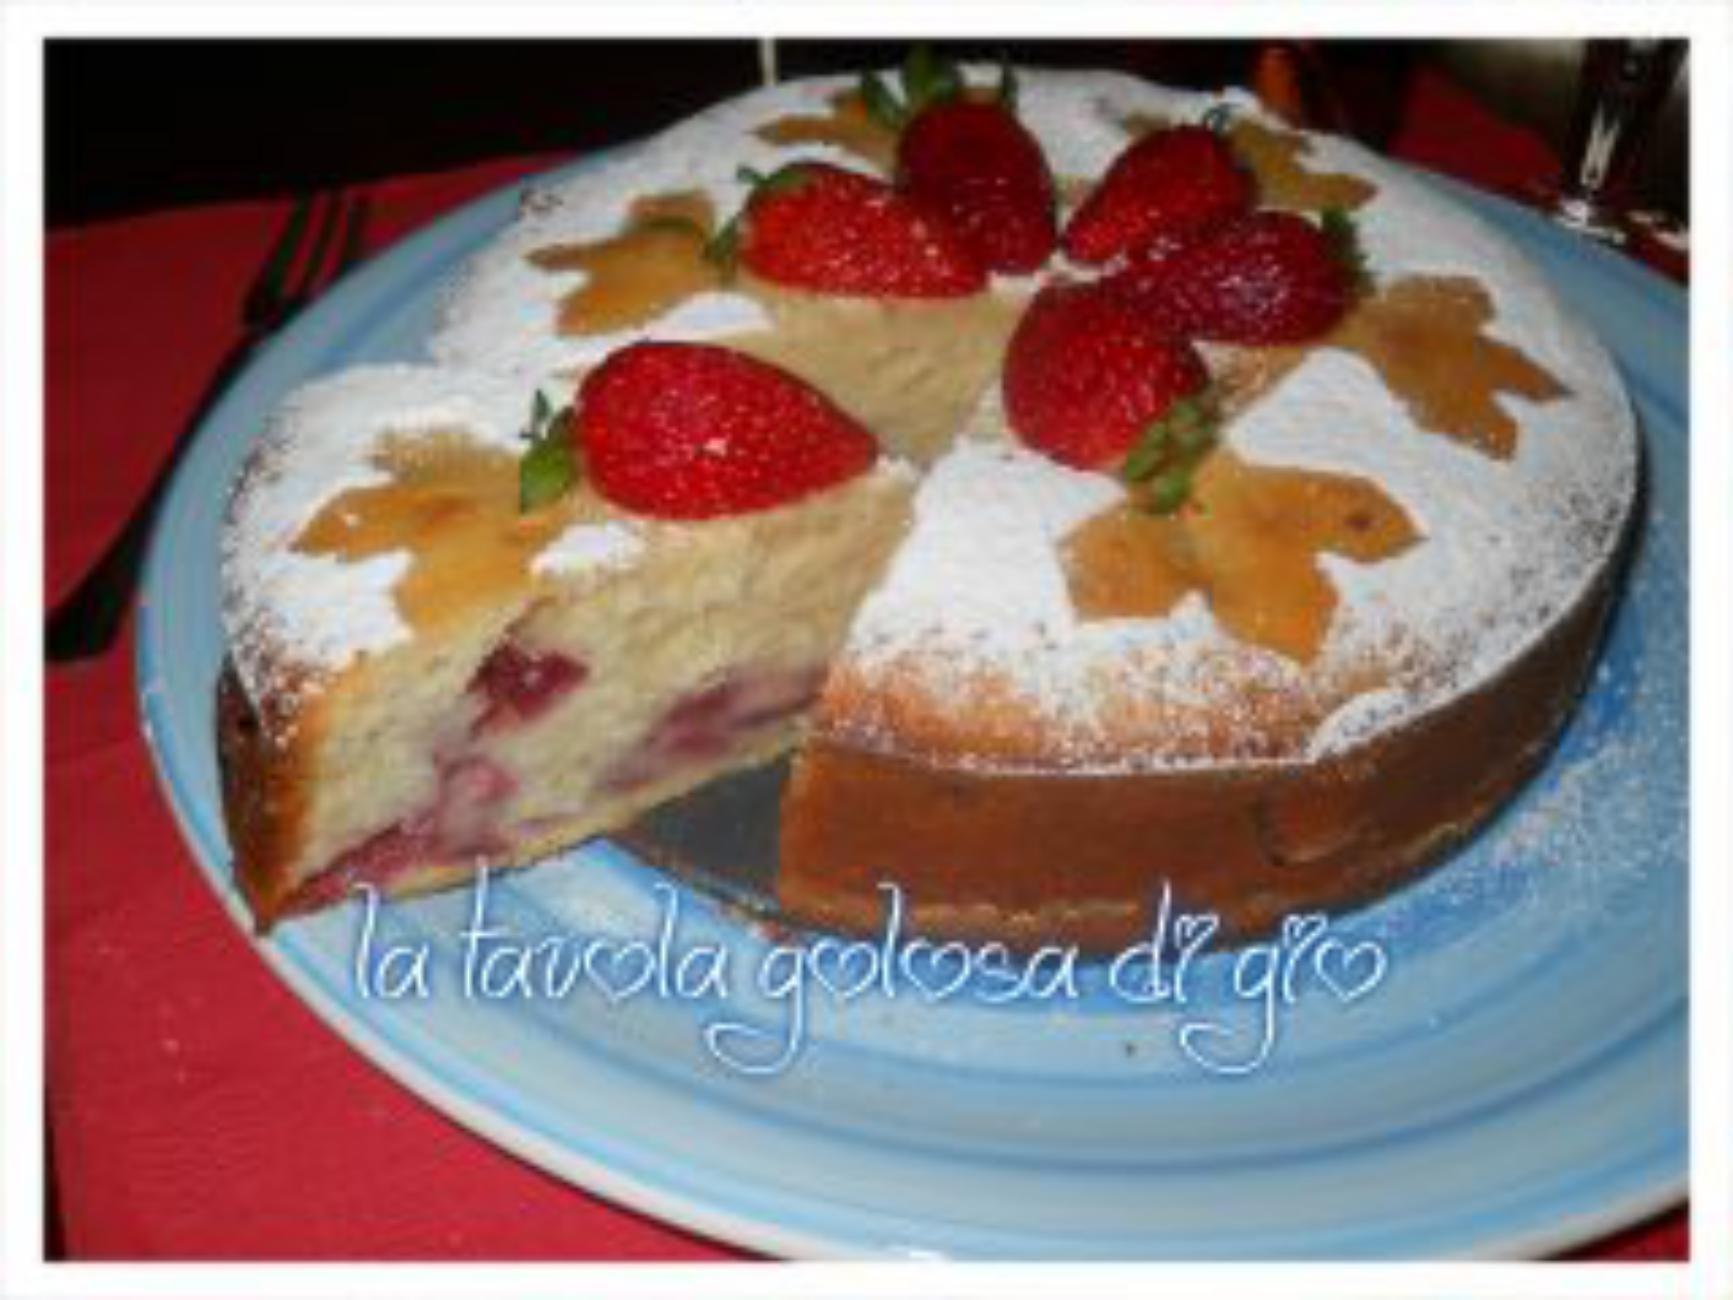 Pranzo Yogurt Magro : Torta di fragole con yogurt magro dolci pinterest